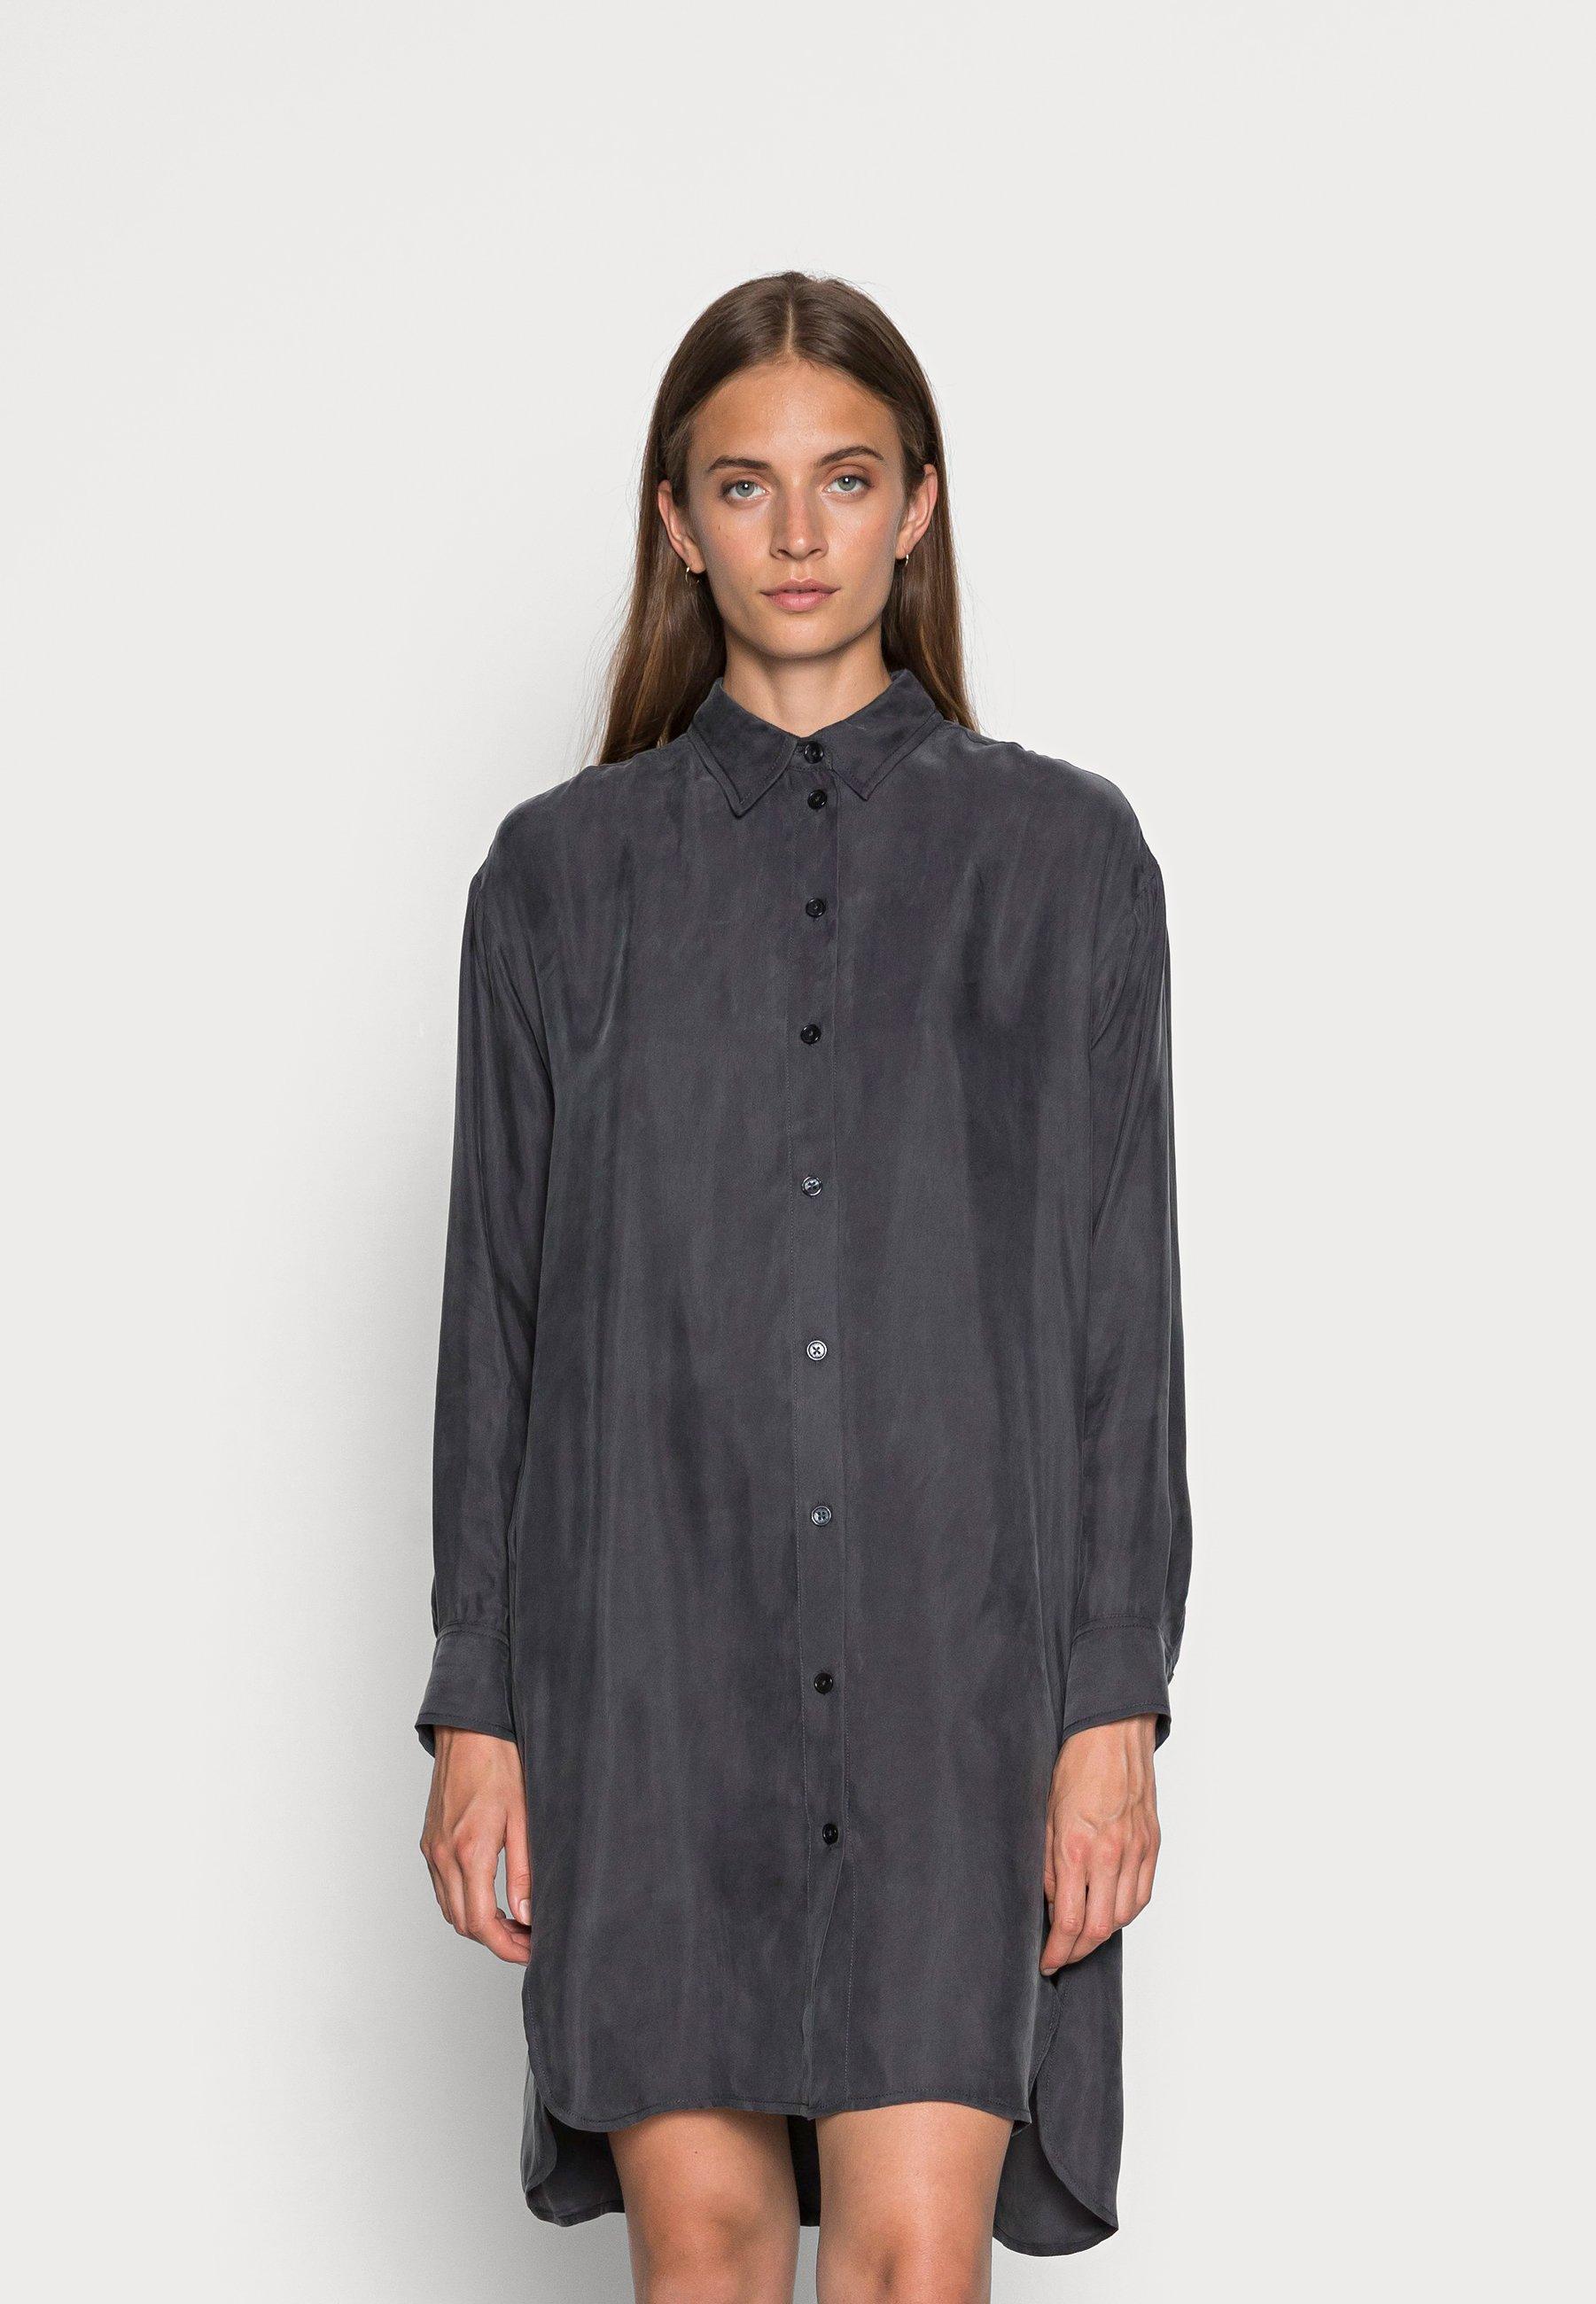 Damen MERYALF WOMAN DRESS - Blusenkleid